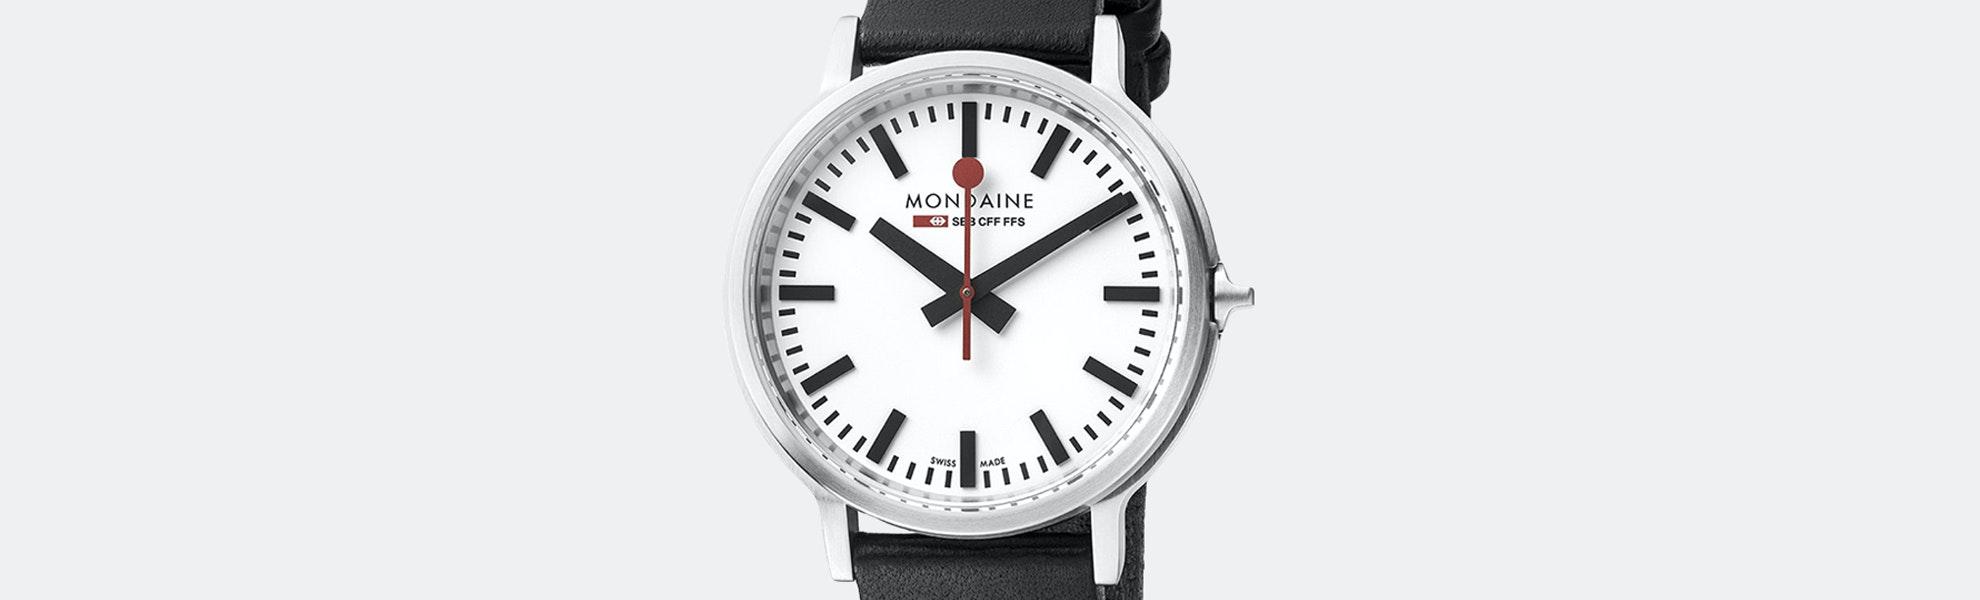 Mondaine Stop2Go Watch